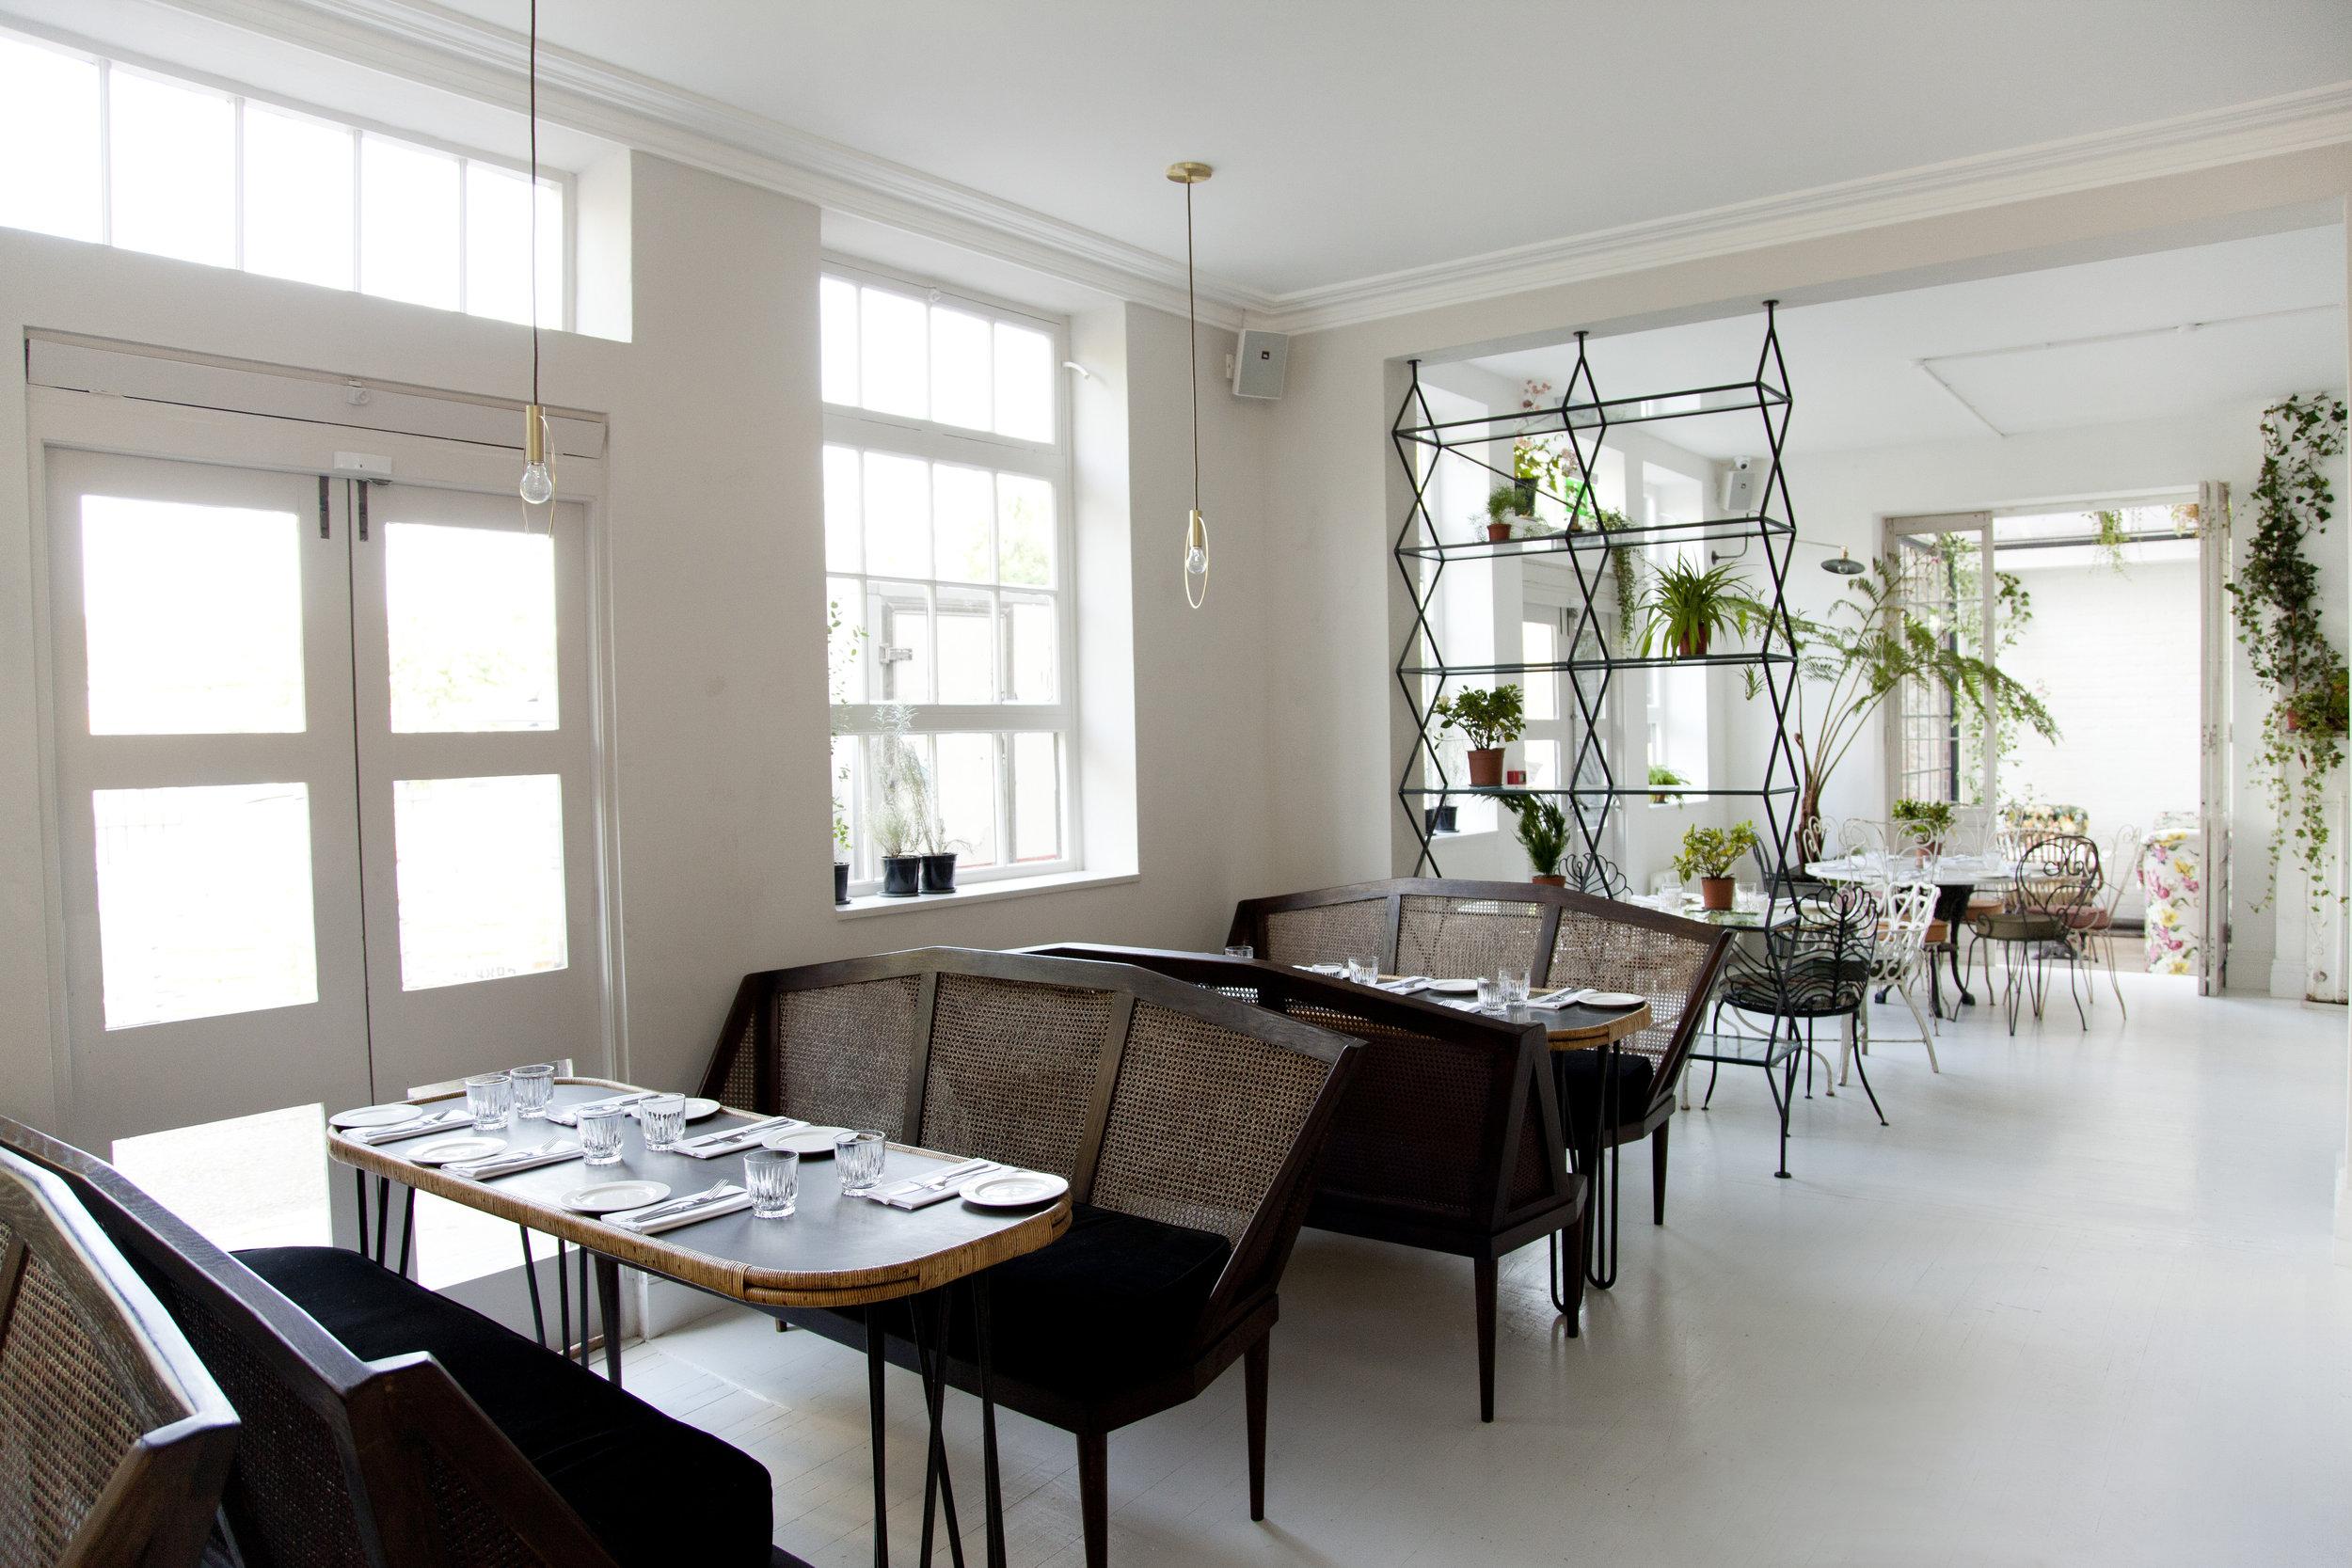 Bourne & Hollingsworth Buildings Café: Clerkenwell's Best Coffee Meeting Location